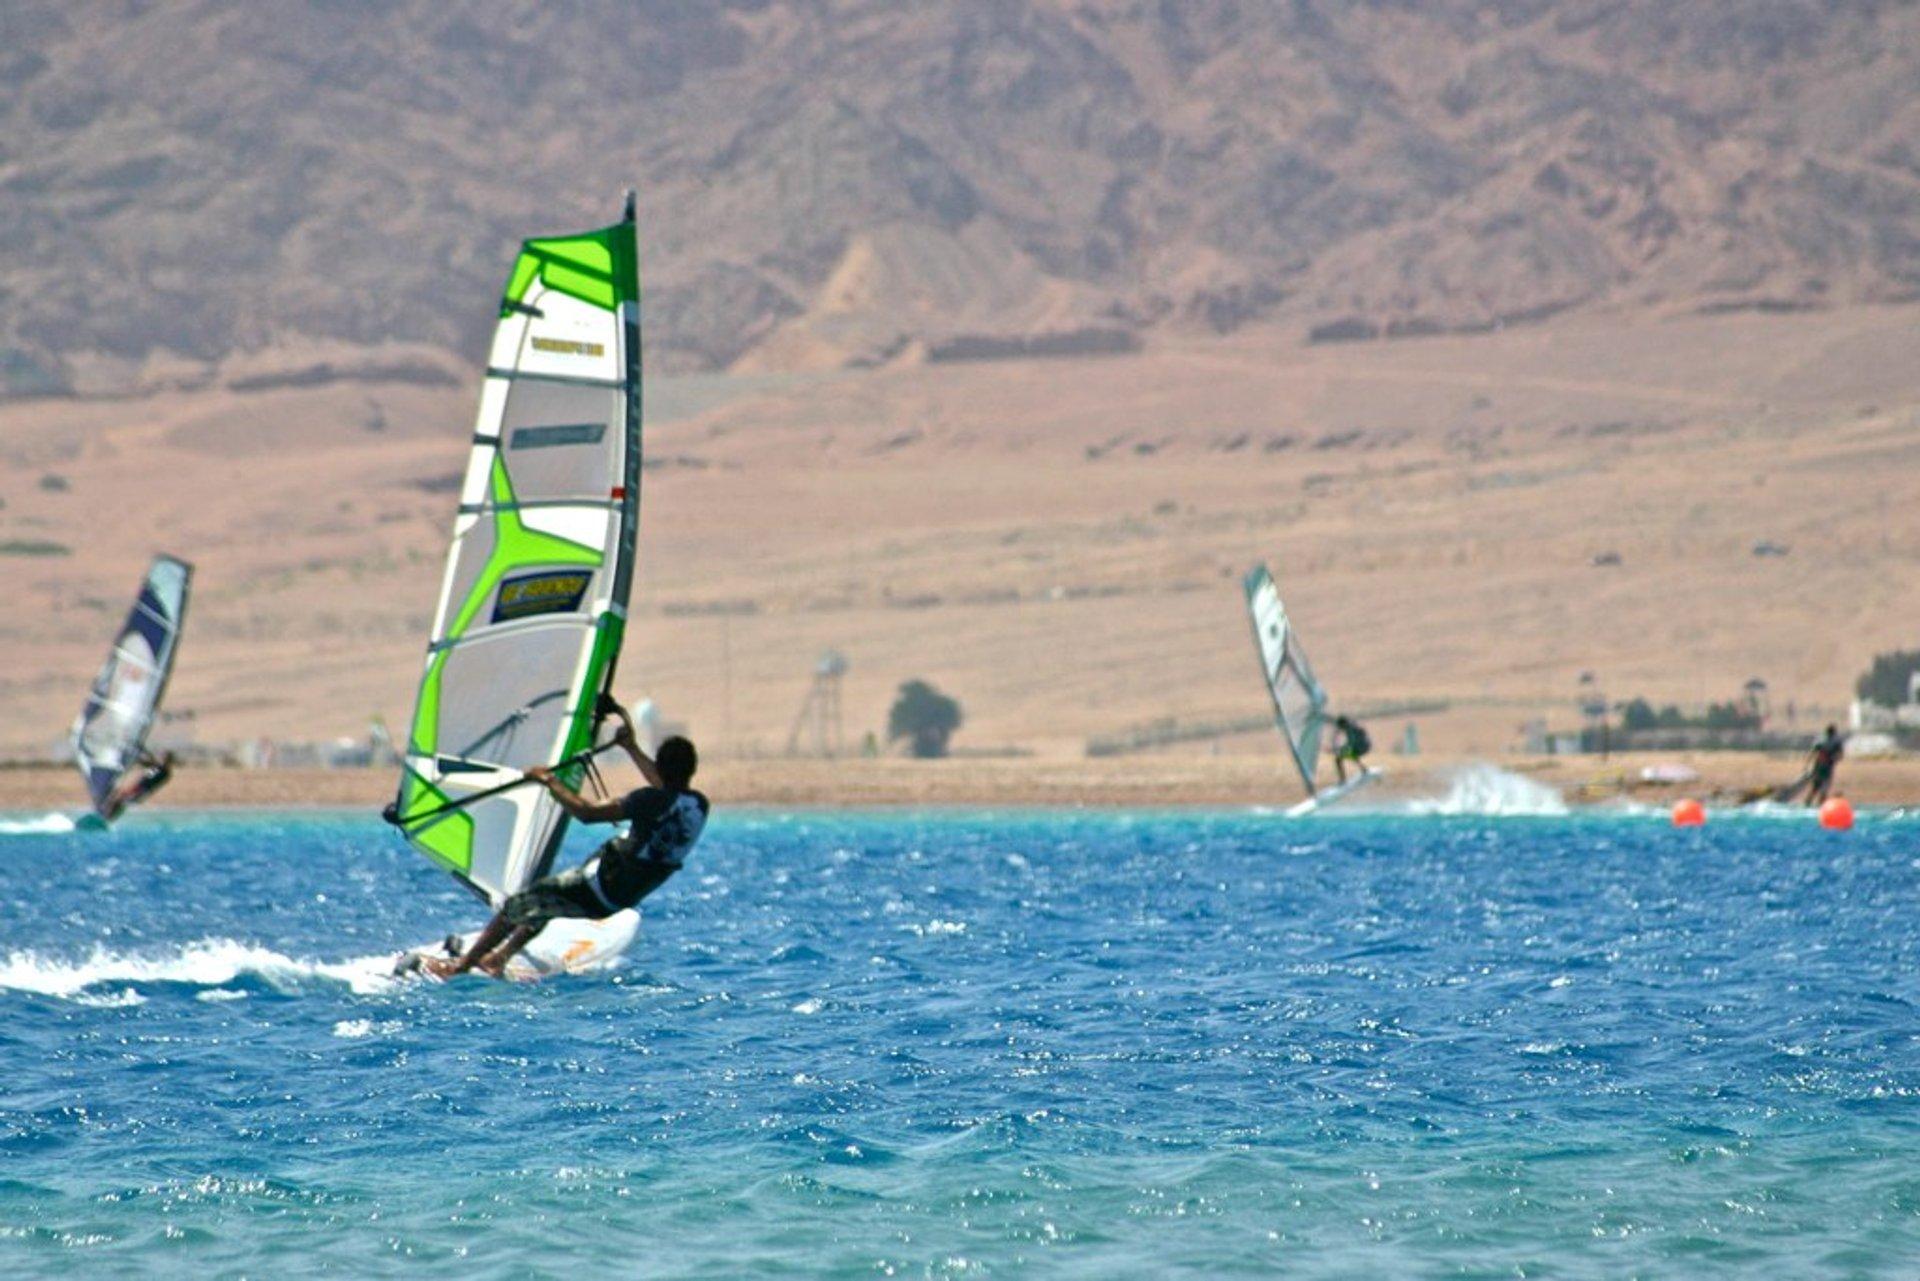 Windsurfing in Dahab in Egypt 2020 - Best Time